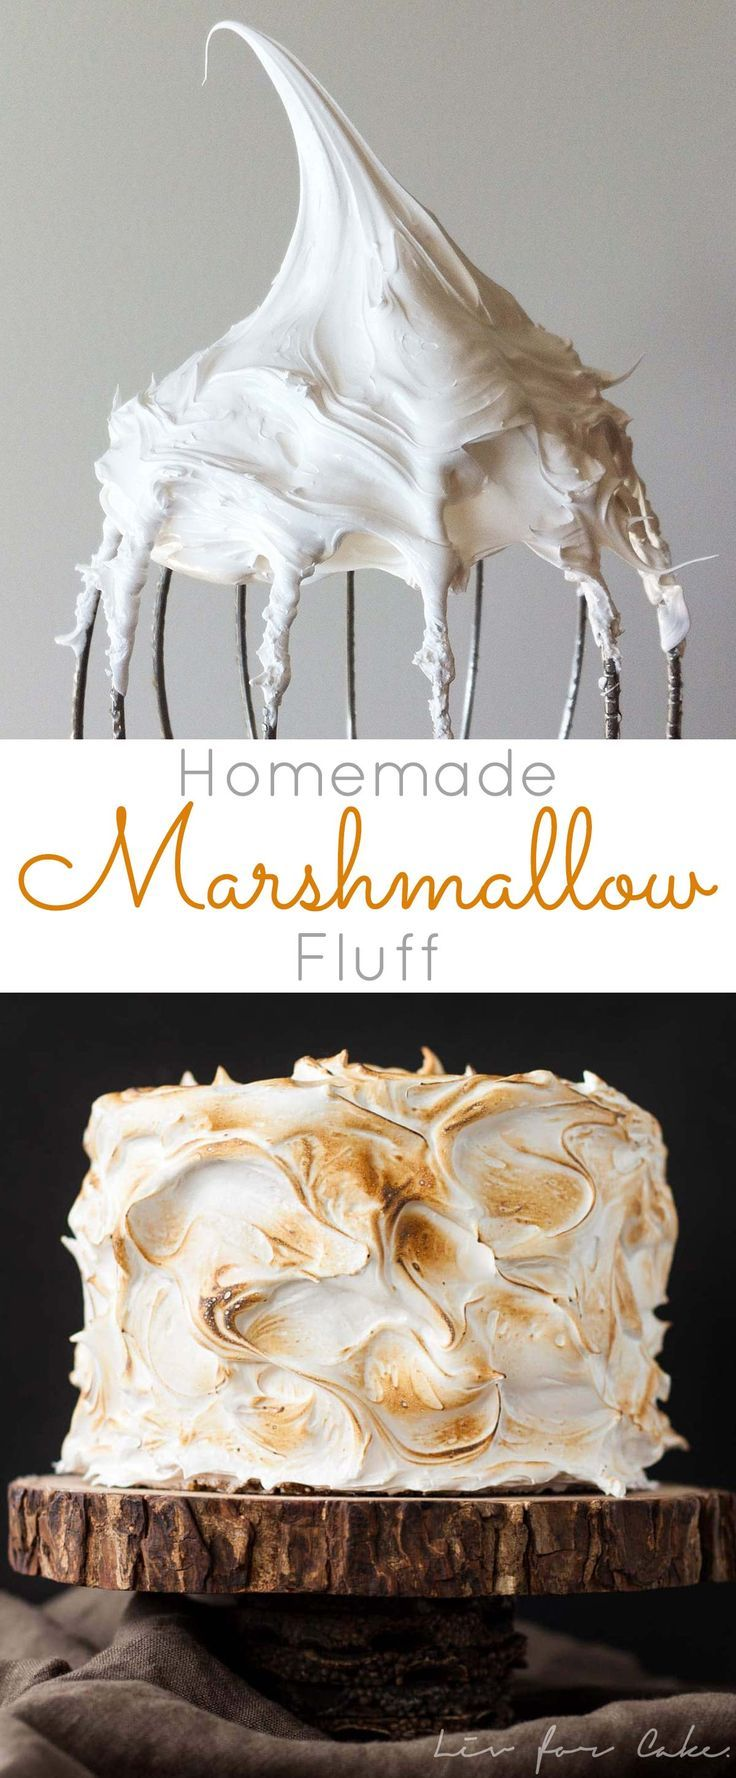 Homemade Marshmallow Fluff